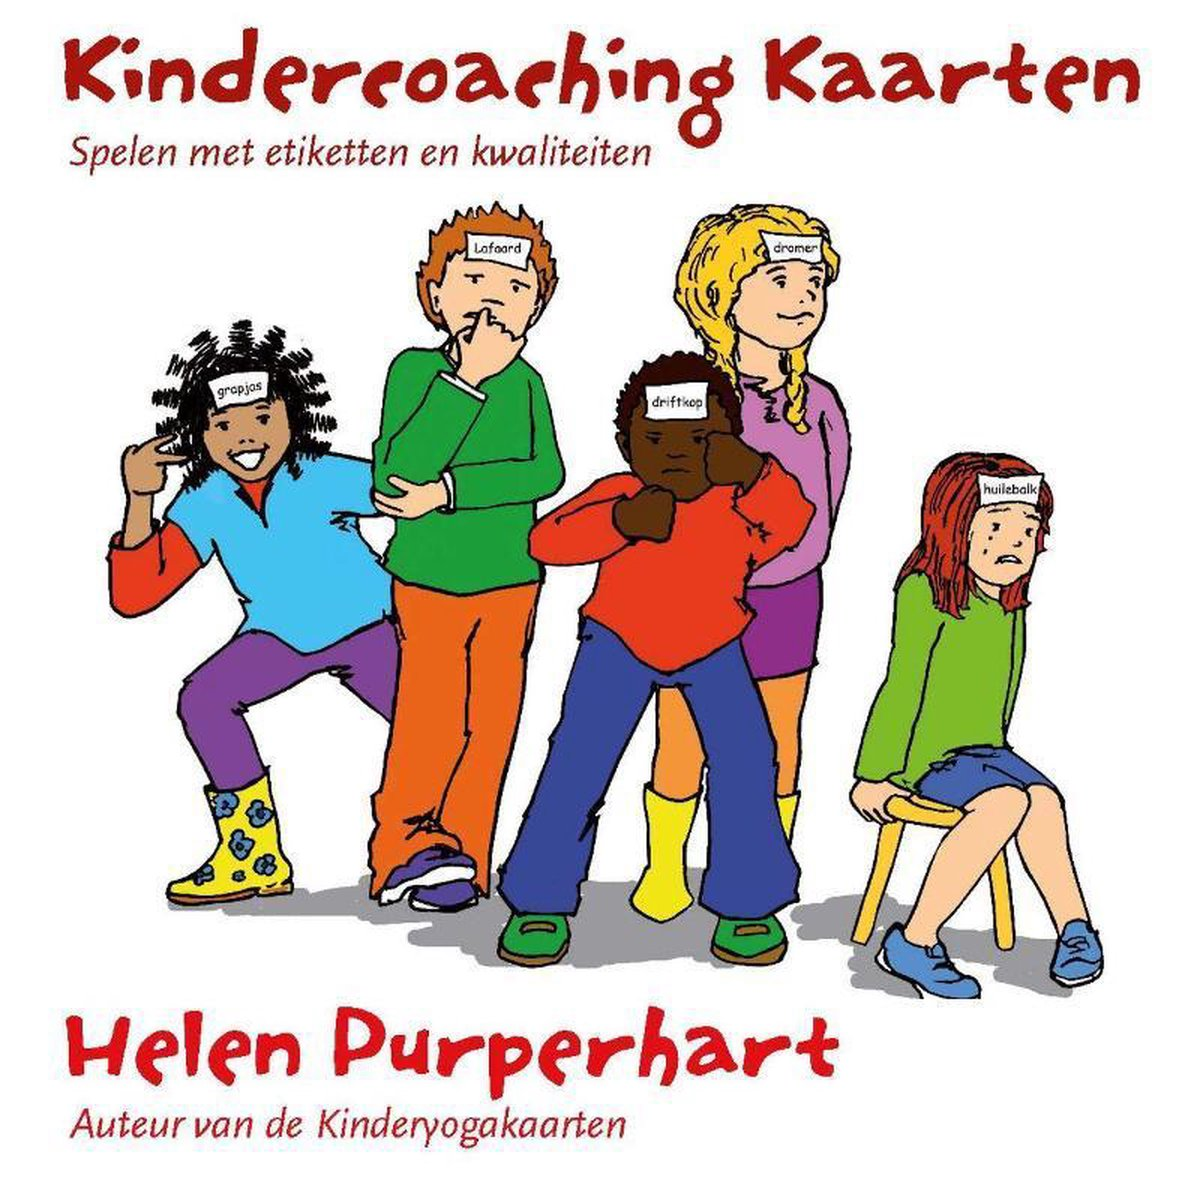 Kinder Coach Kaarten